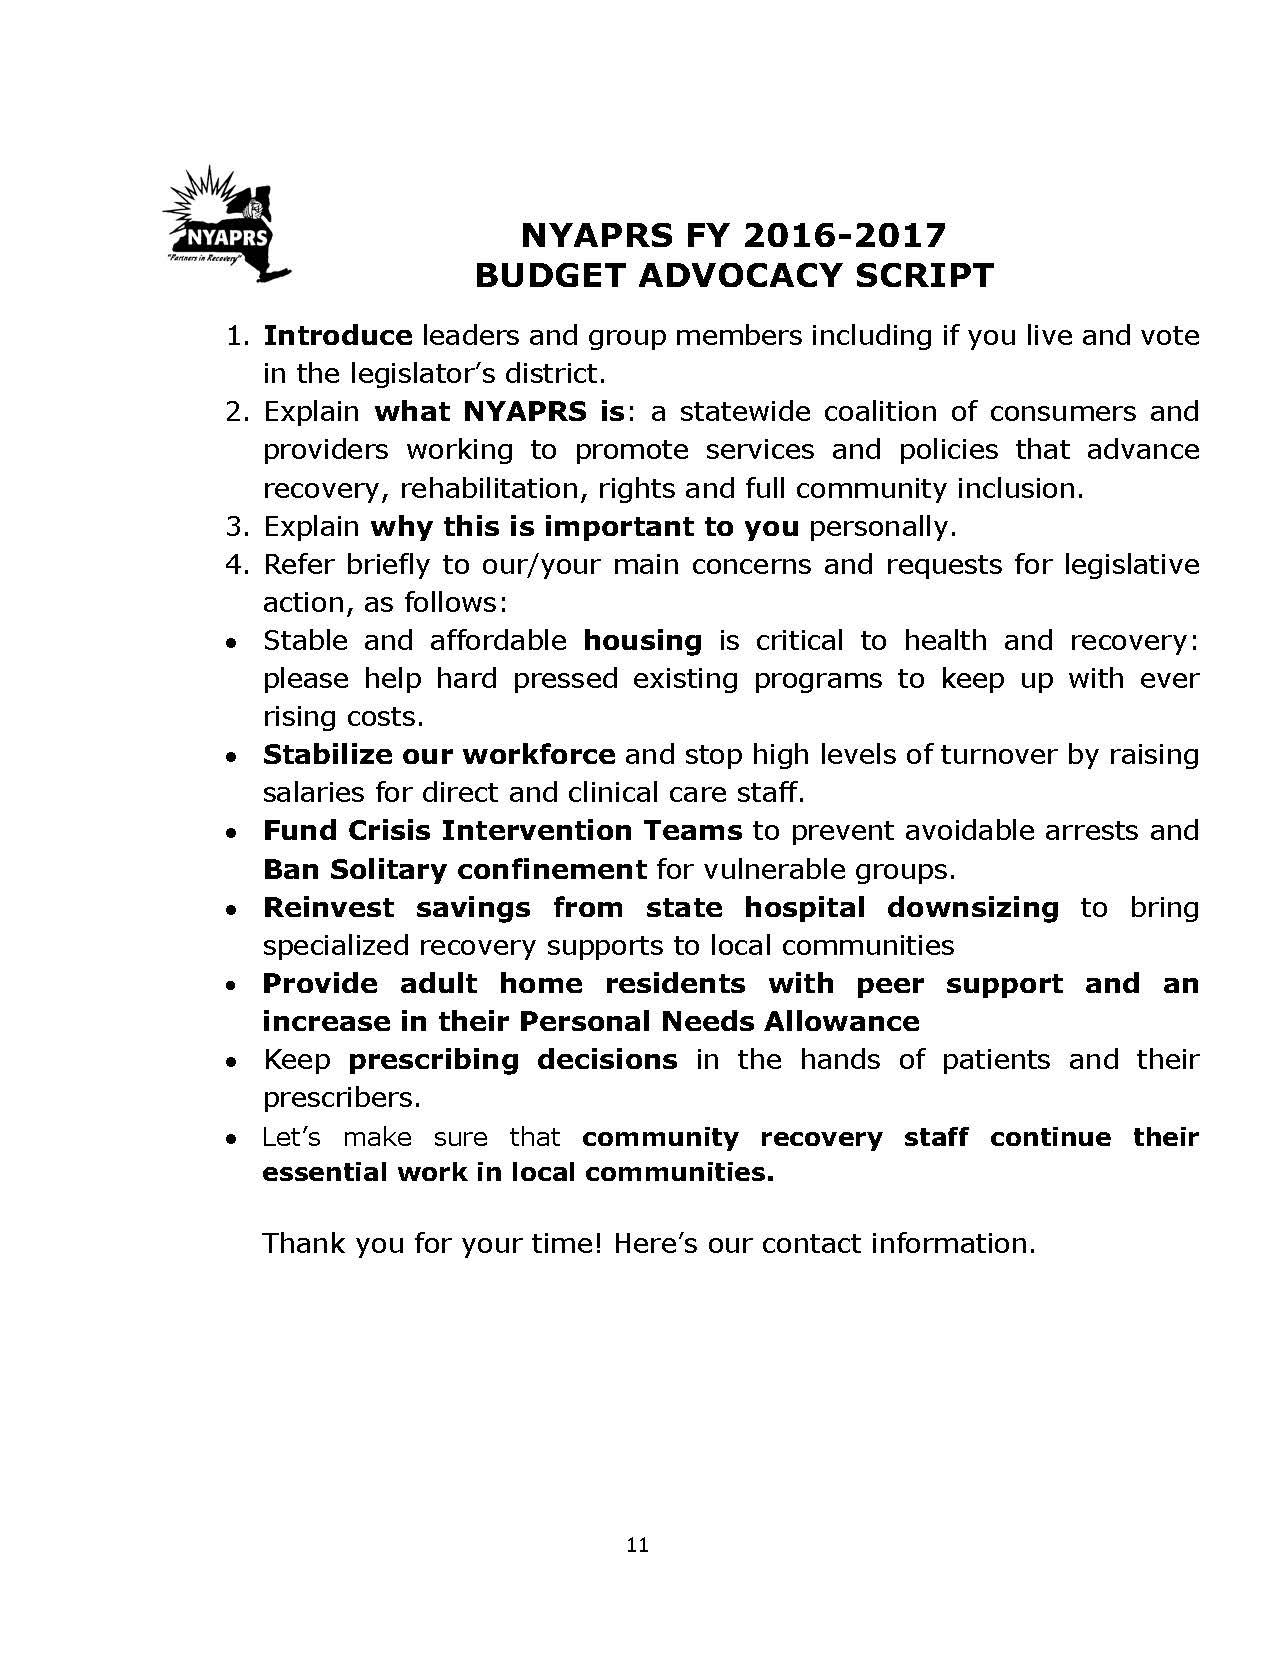 NYAPRS Final 2018 Legislative Day Book_Page_11.jpg